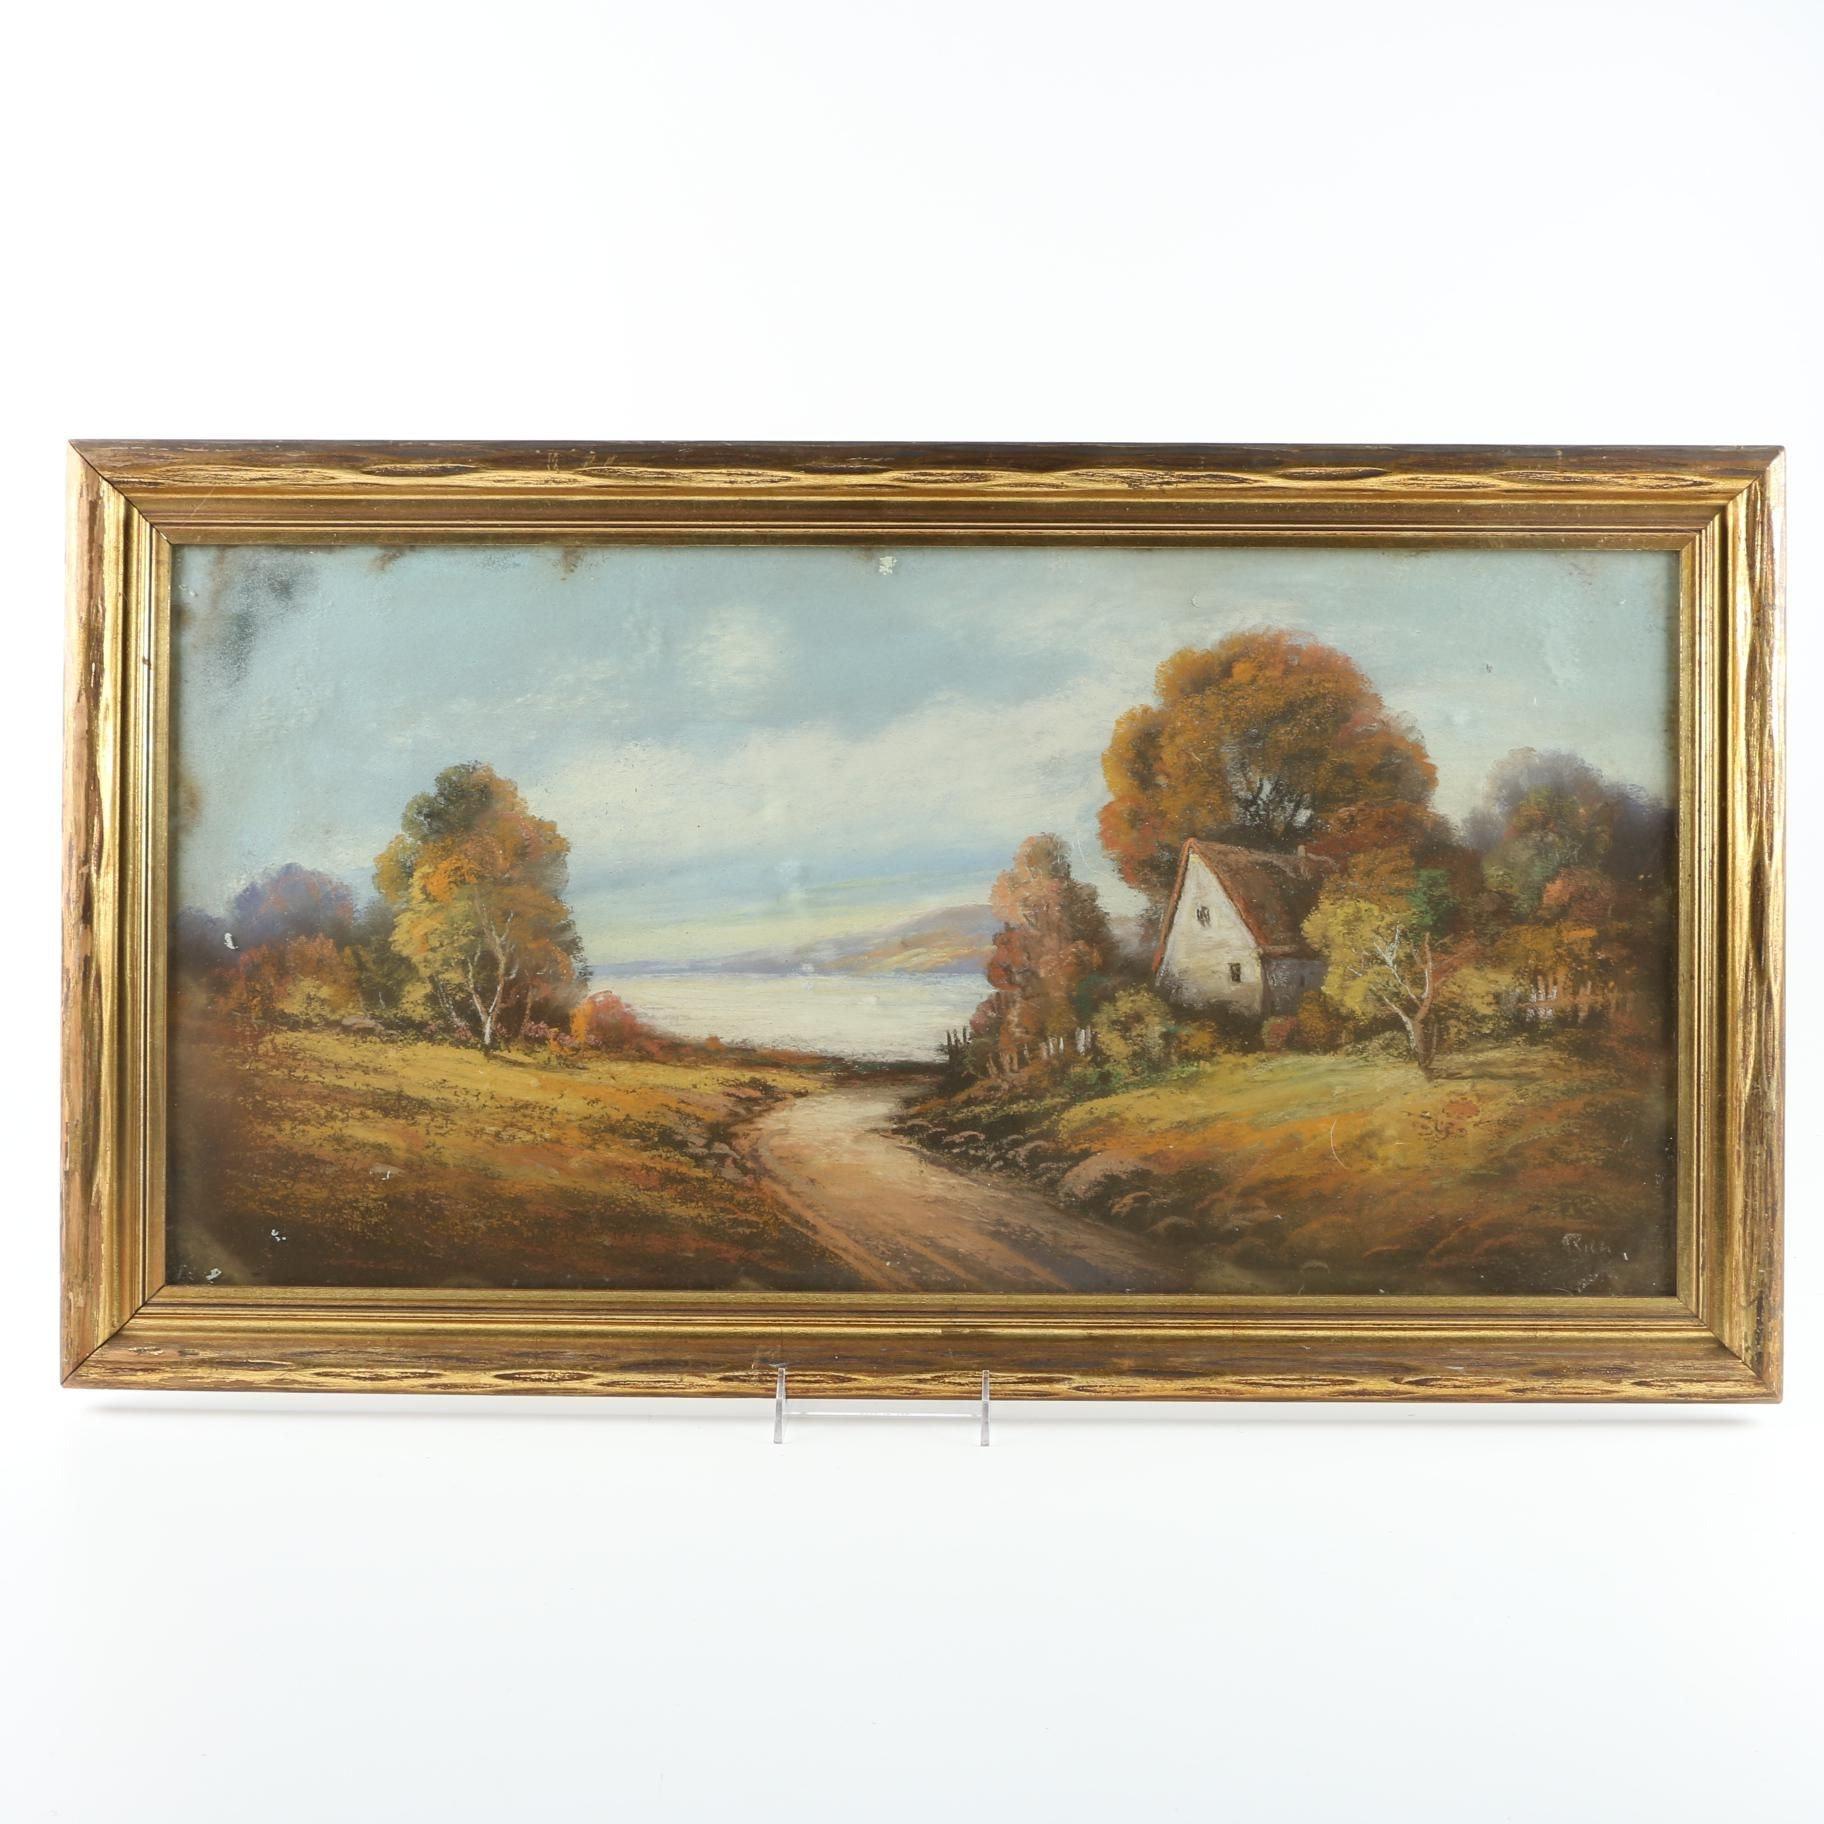 Framed Gouache Painting on Cardboard of Rural Landscape